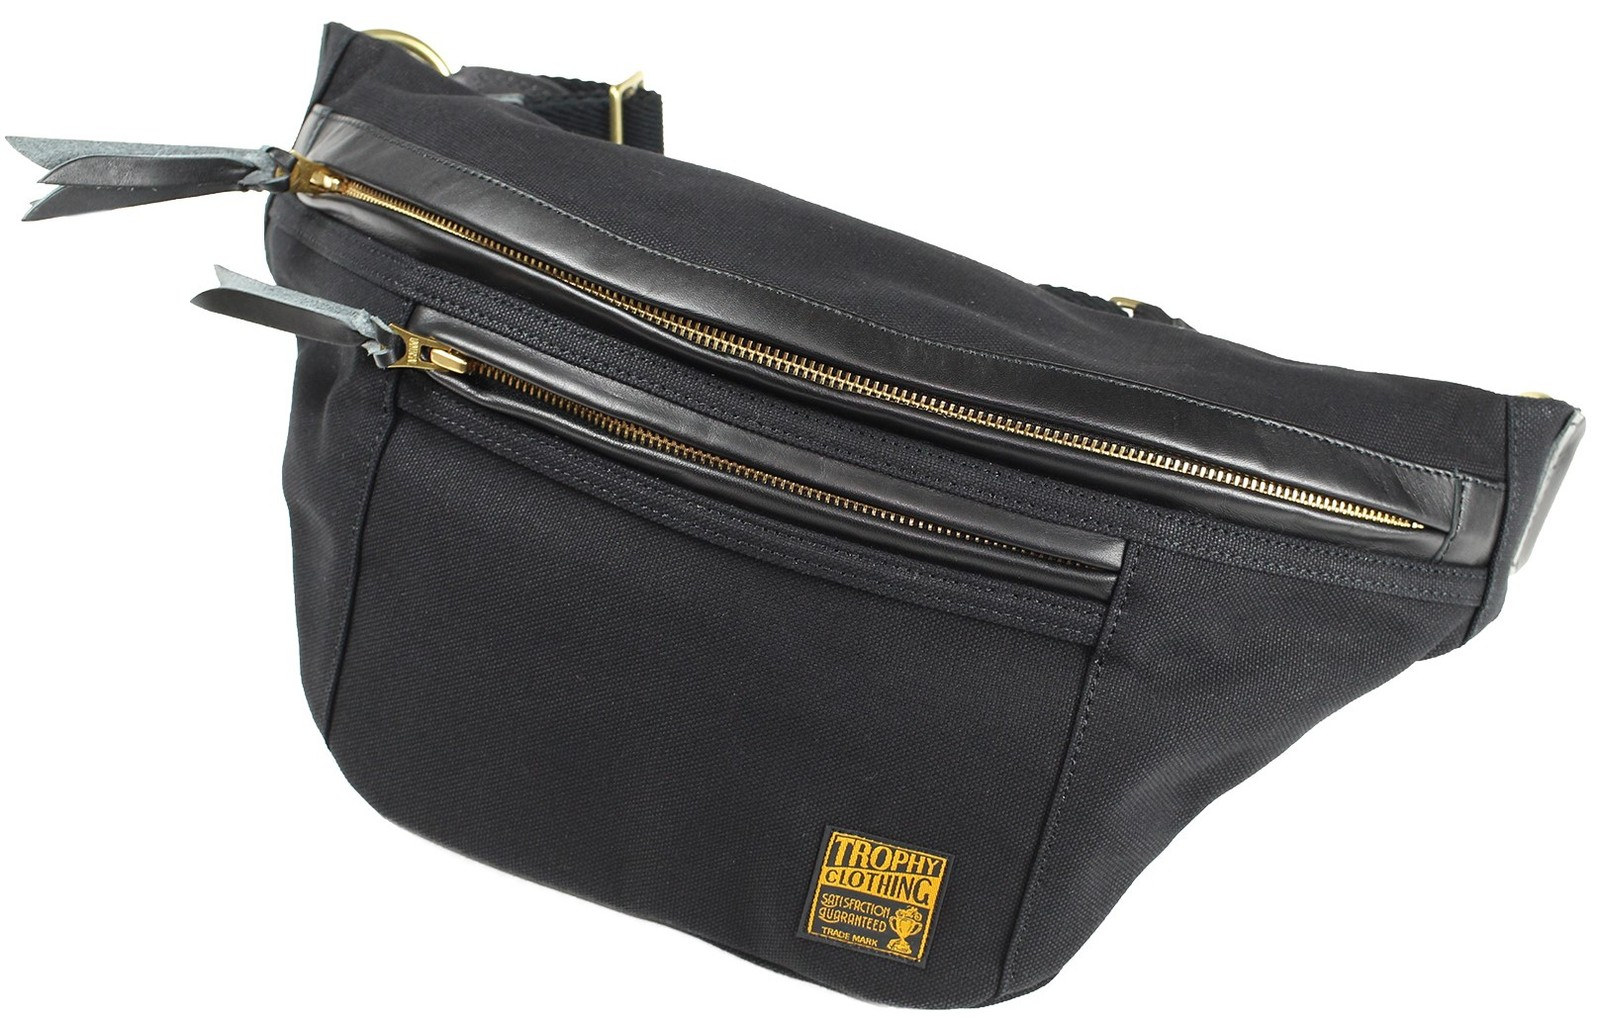 TROPHY CLOTHING [-Day Trip Bag- Black]